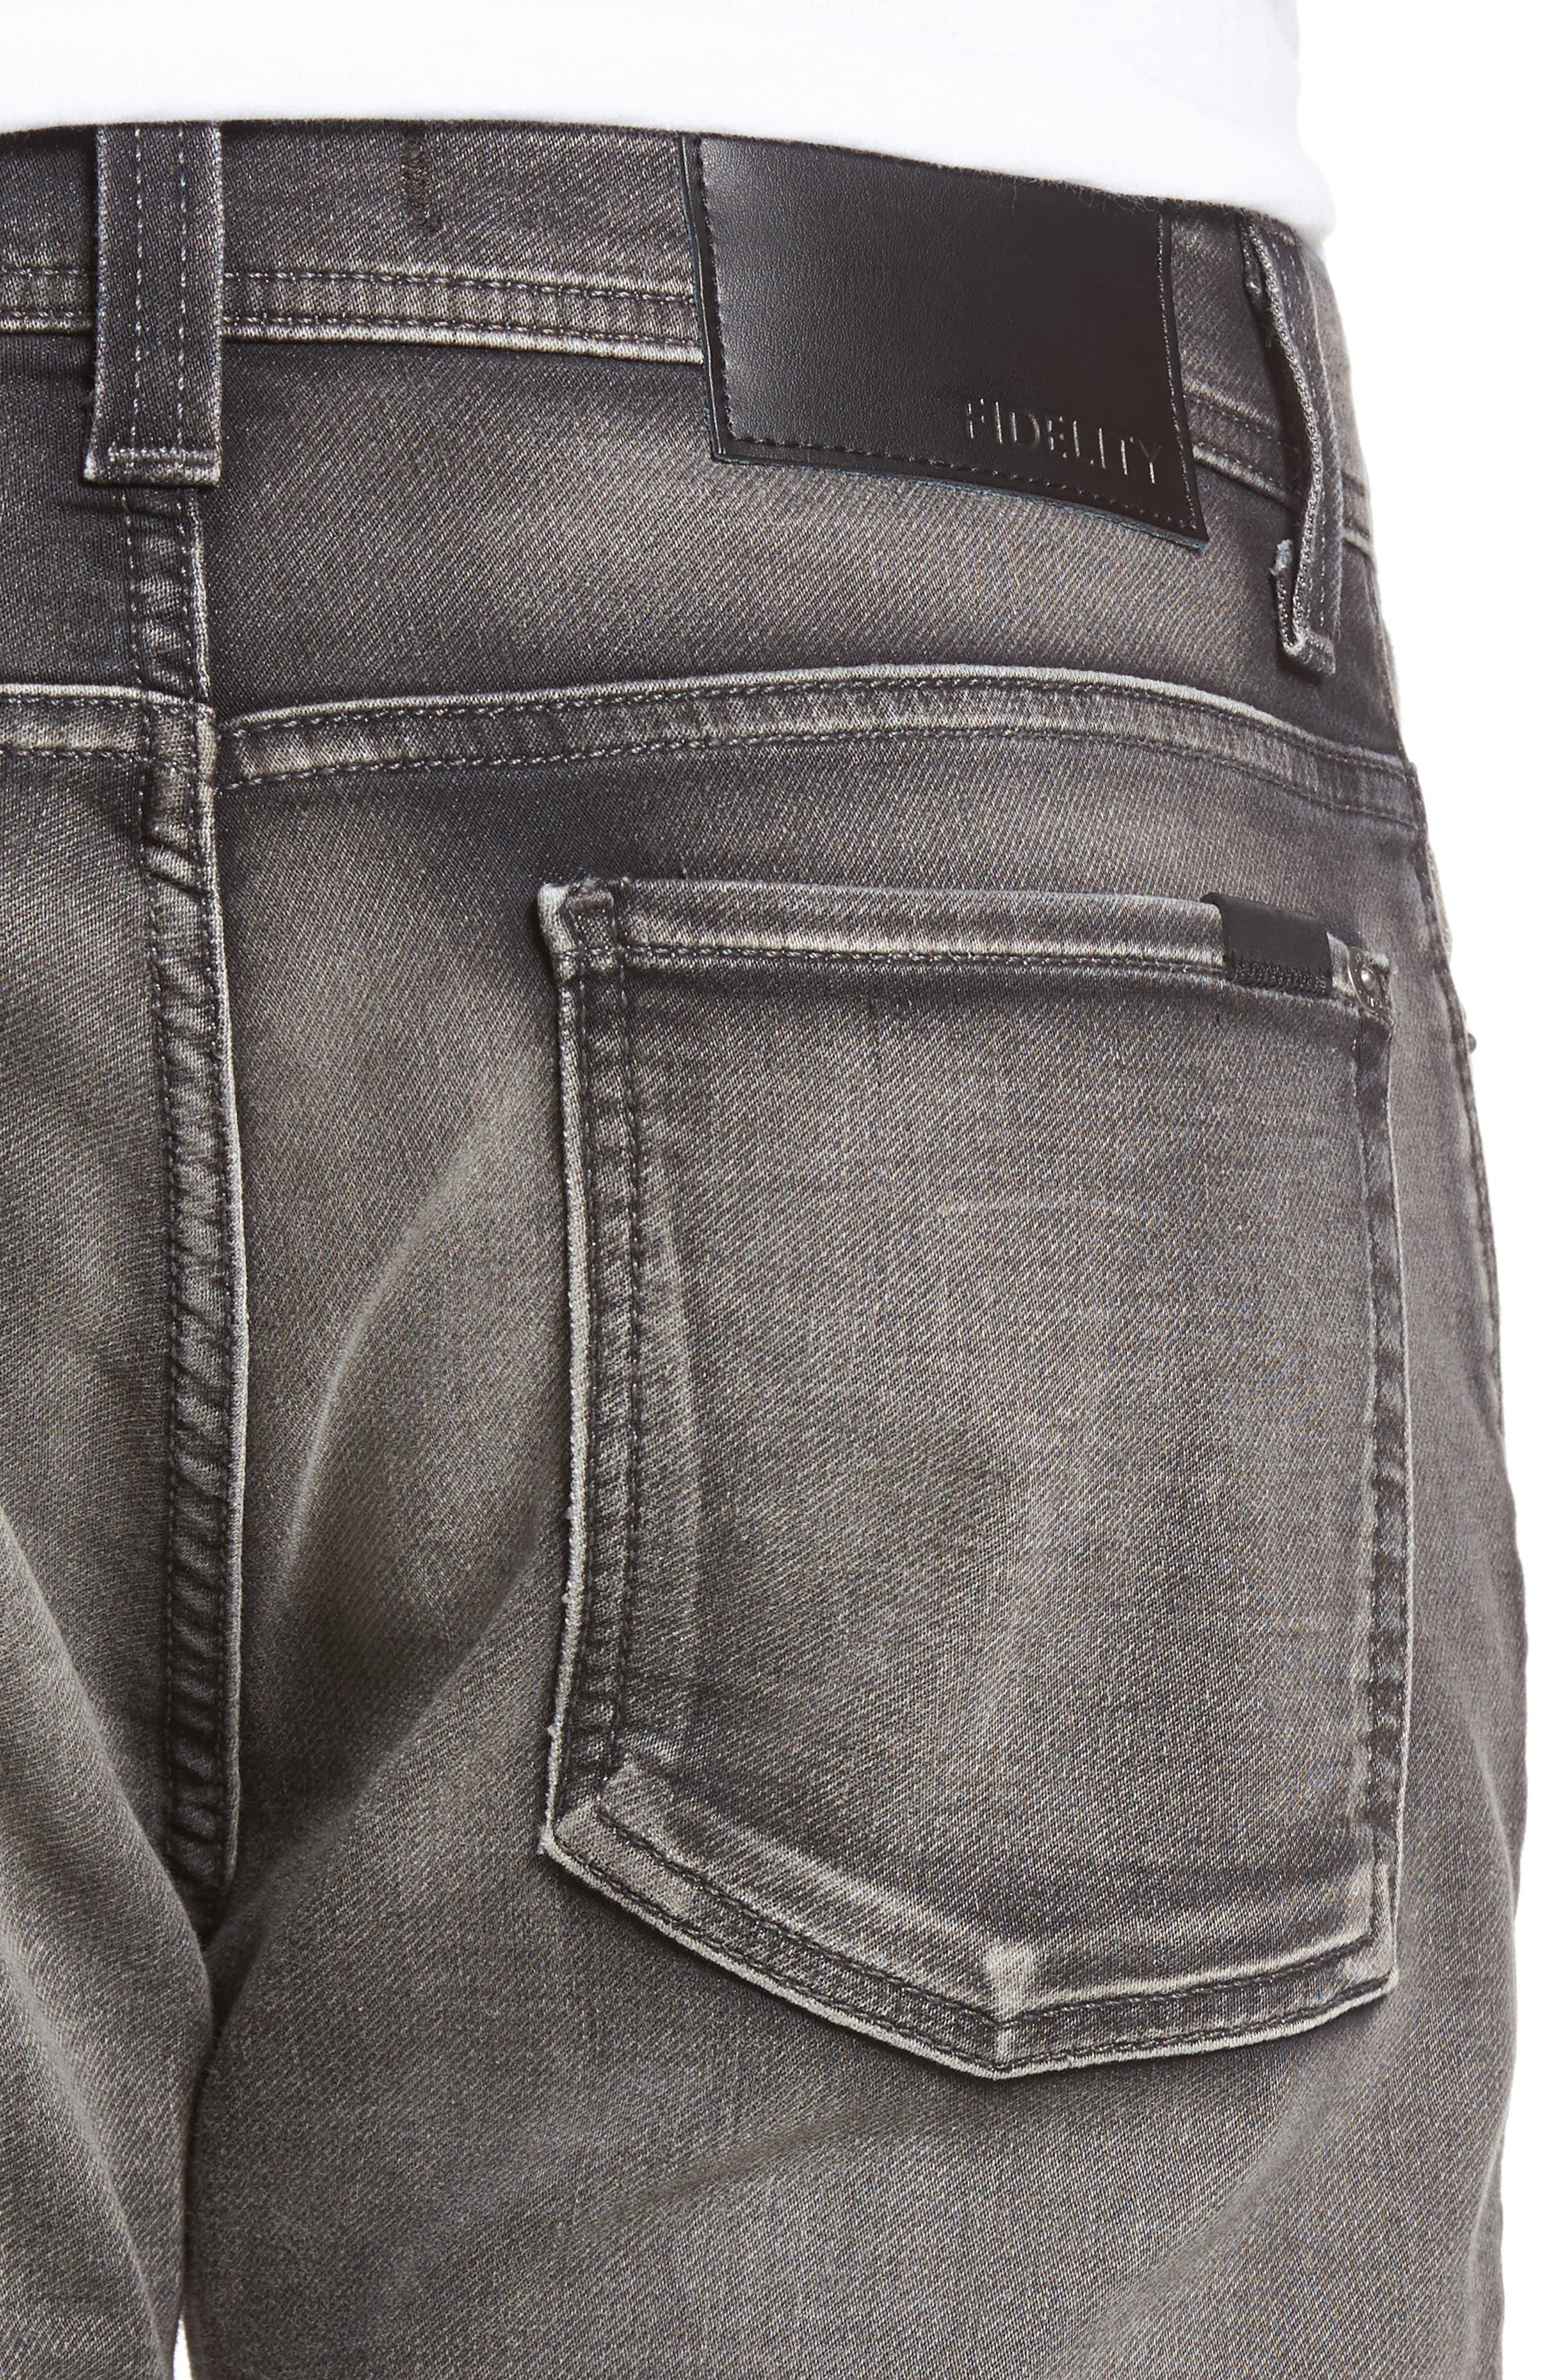 Fidelity Jimmy Slim Fit Jeans,                             Alternate thumbnail 4, color,                             001